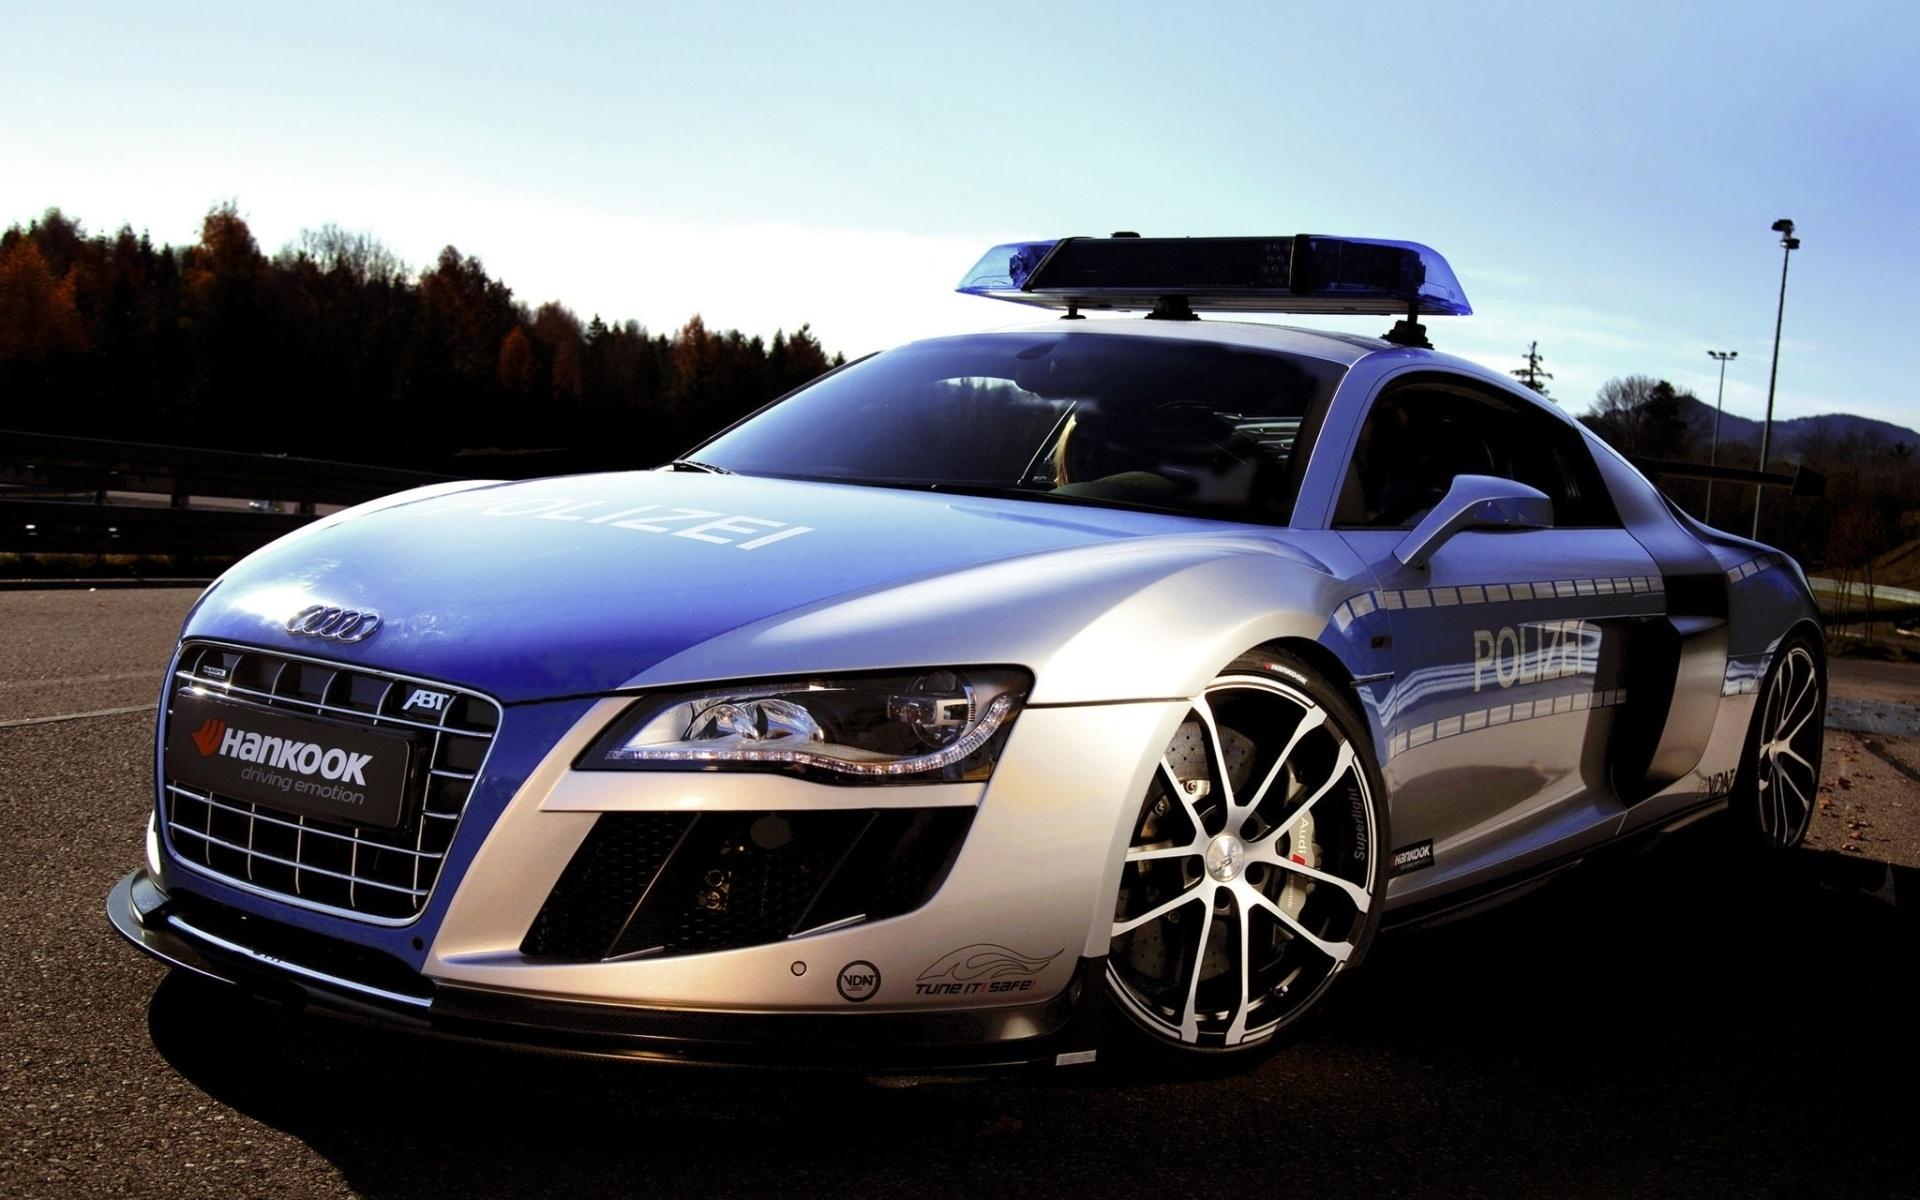 ... Police Car Wallpaper Free Wallpaper Pics Pictures Hd for Desktop